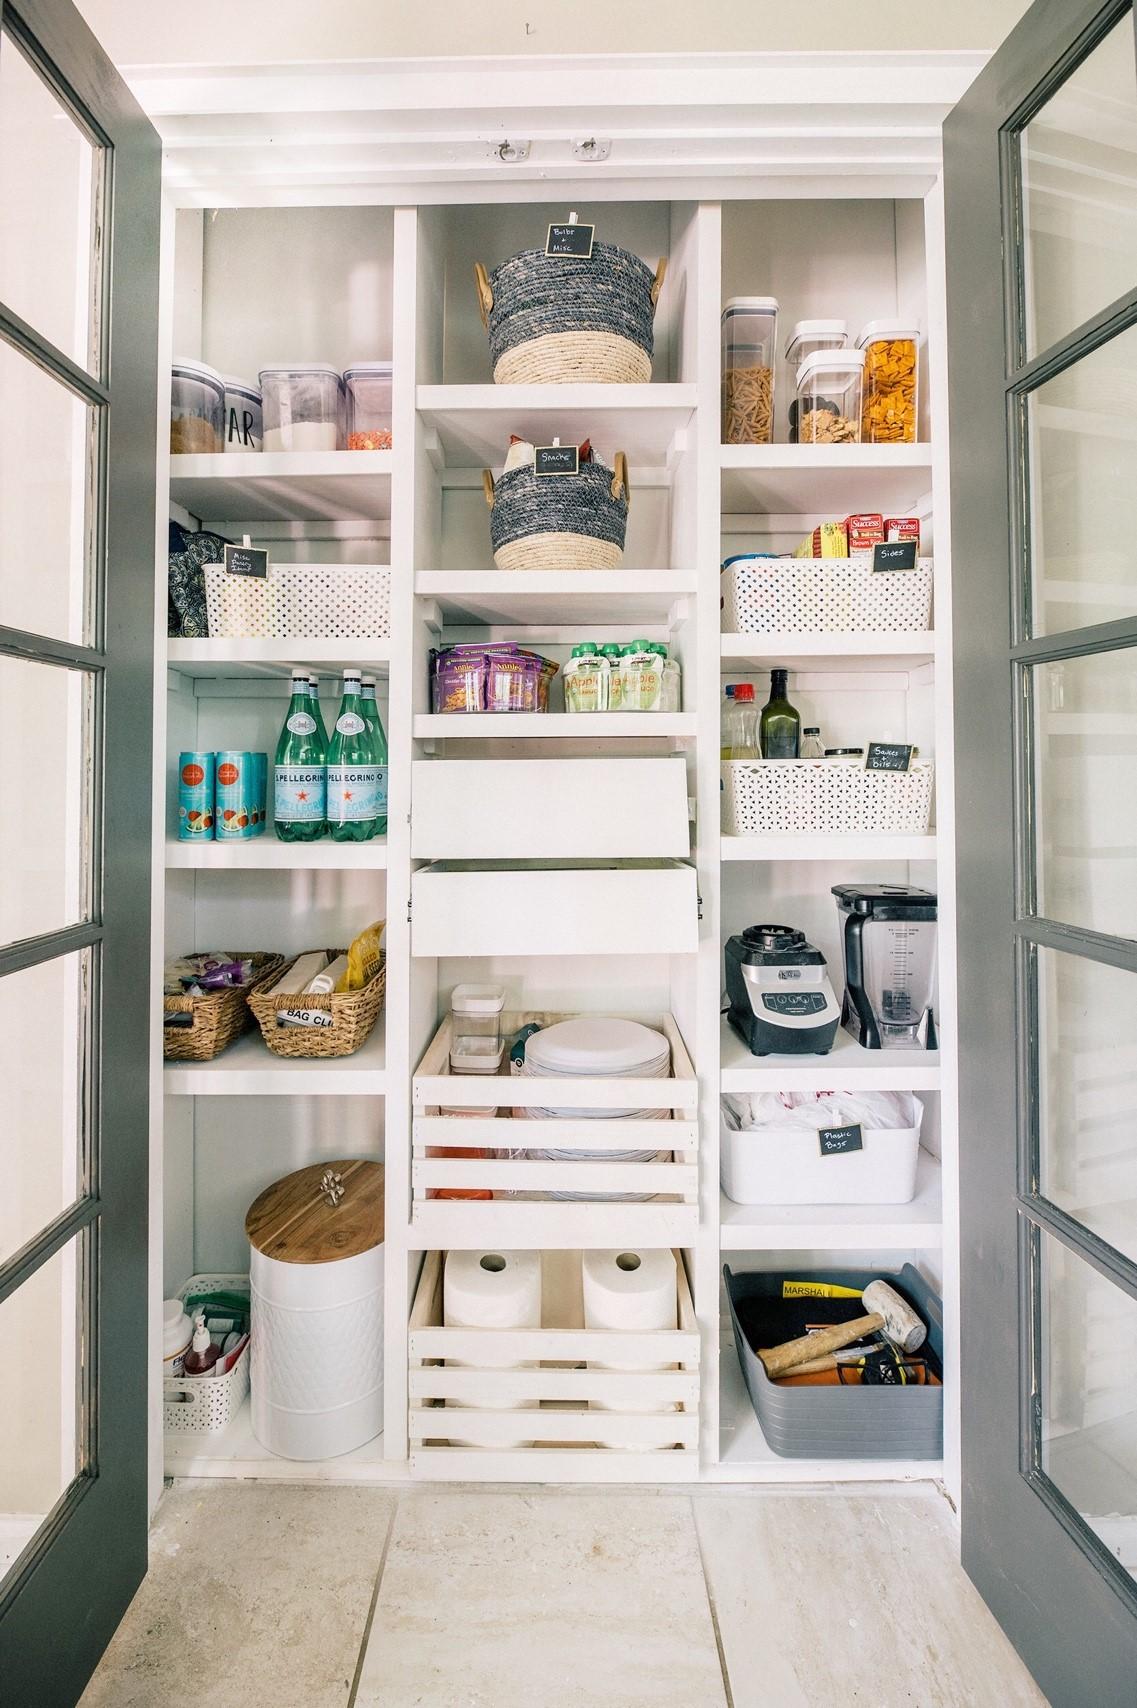 The Ultimate Custom Pantry DIY Shelves Tutorial - Live ...